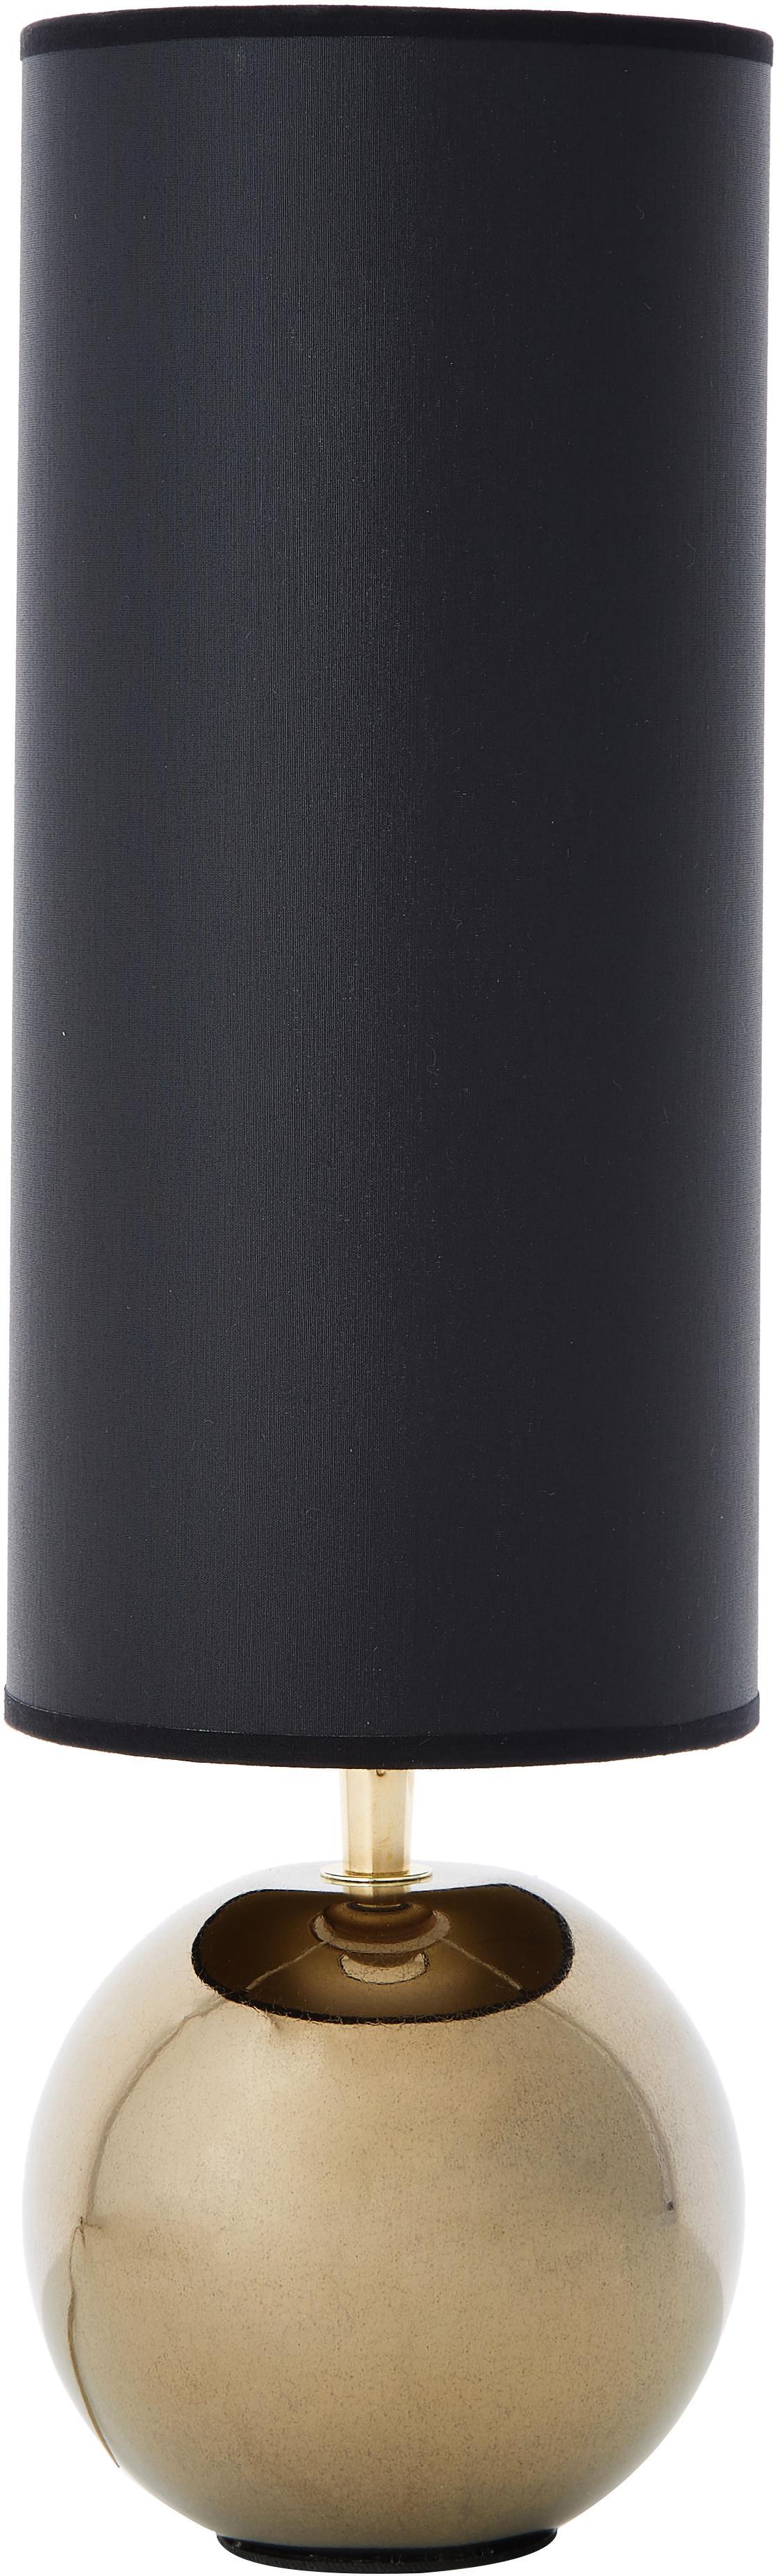 Keramische tafellamp Neve, Lampenkap: polyester, Lampvoet: keramiek, Zwart, goudkleurig, Ø 15 x H 52 cm